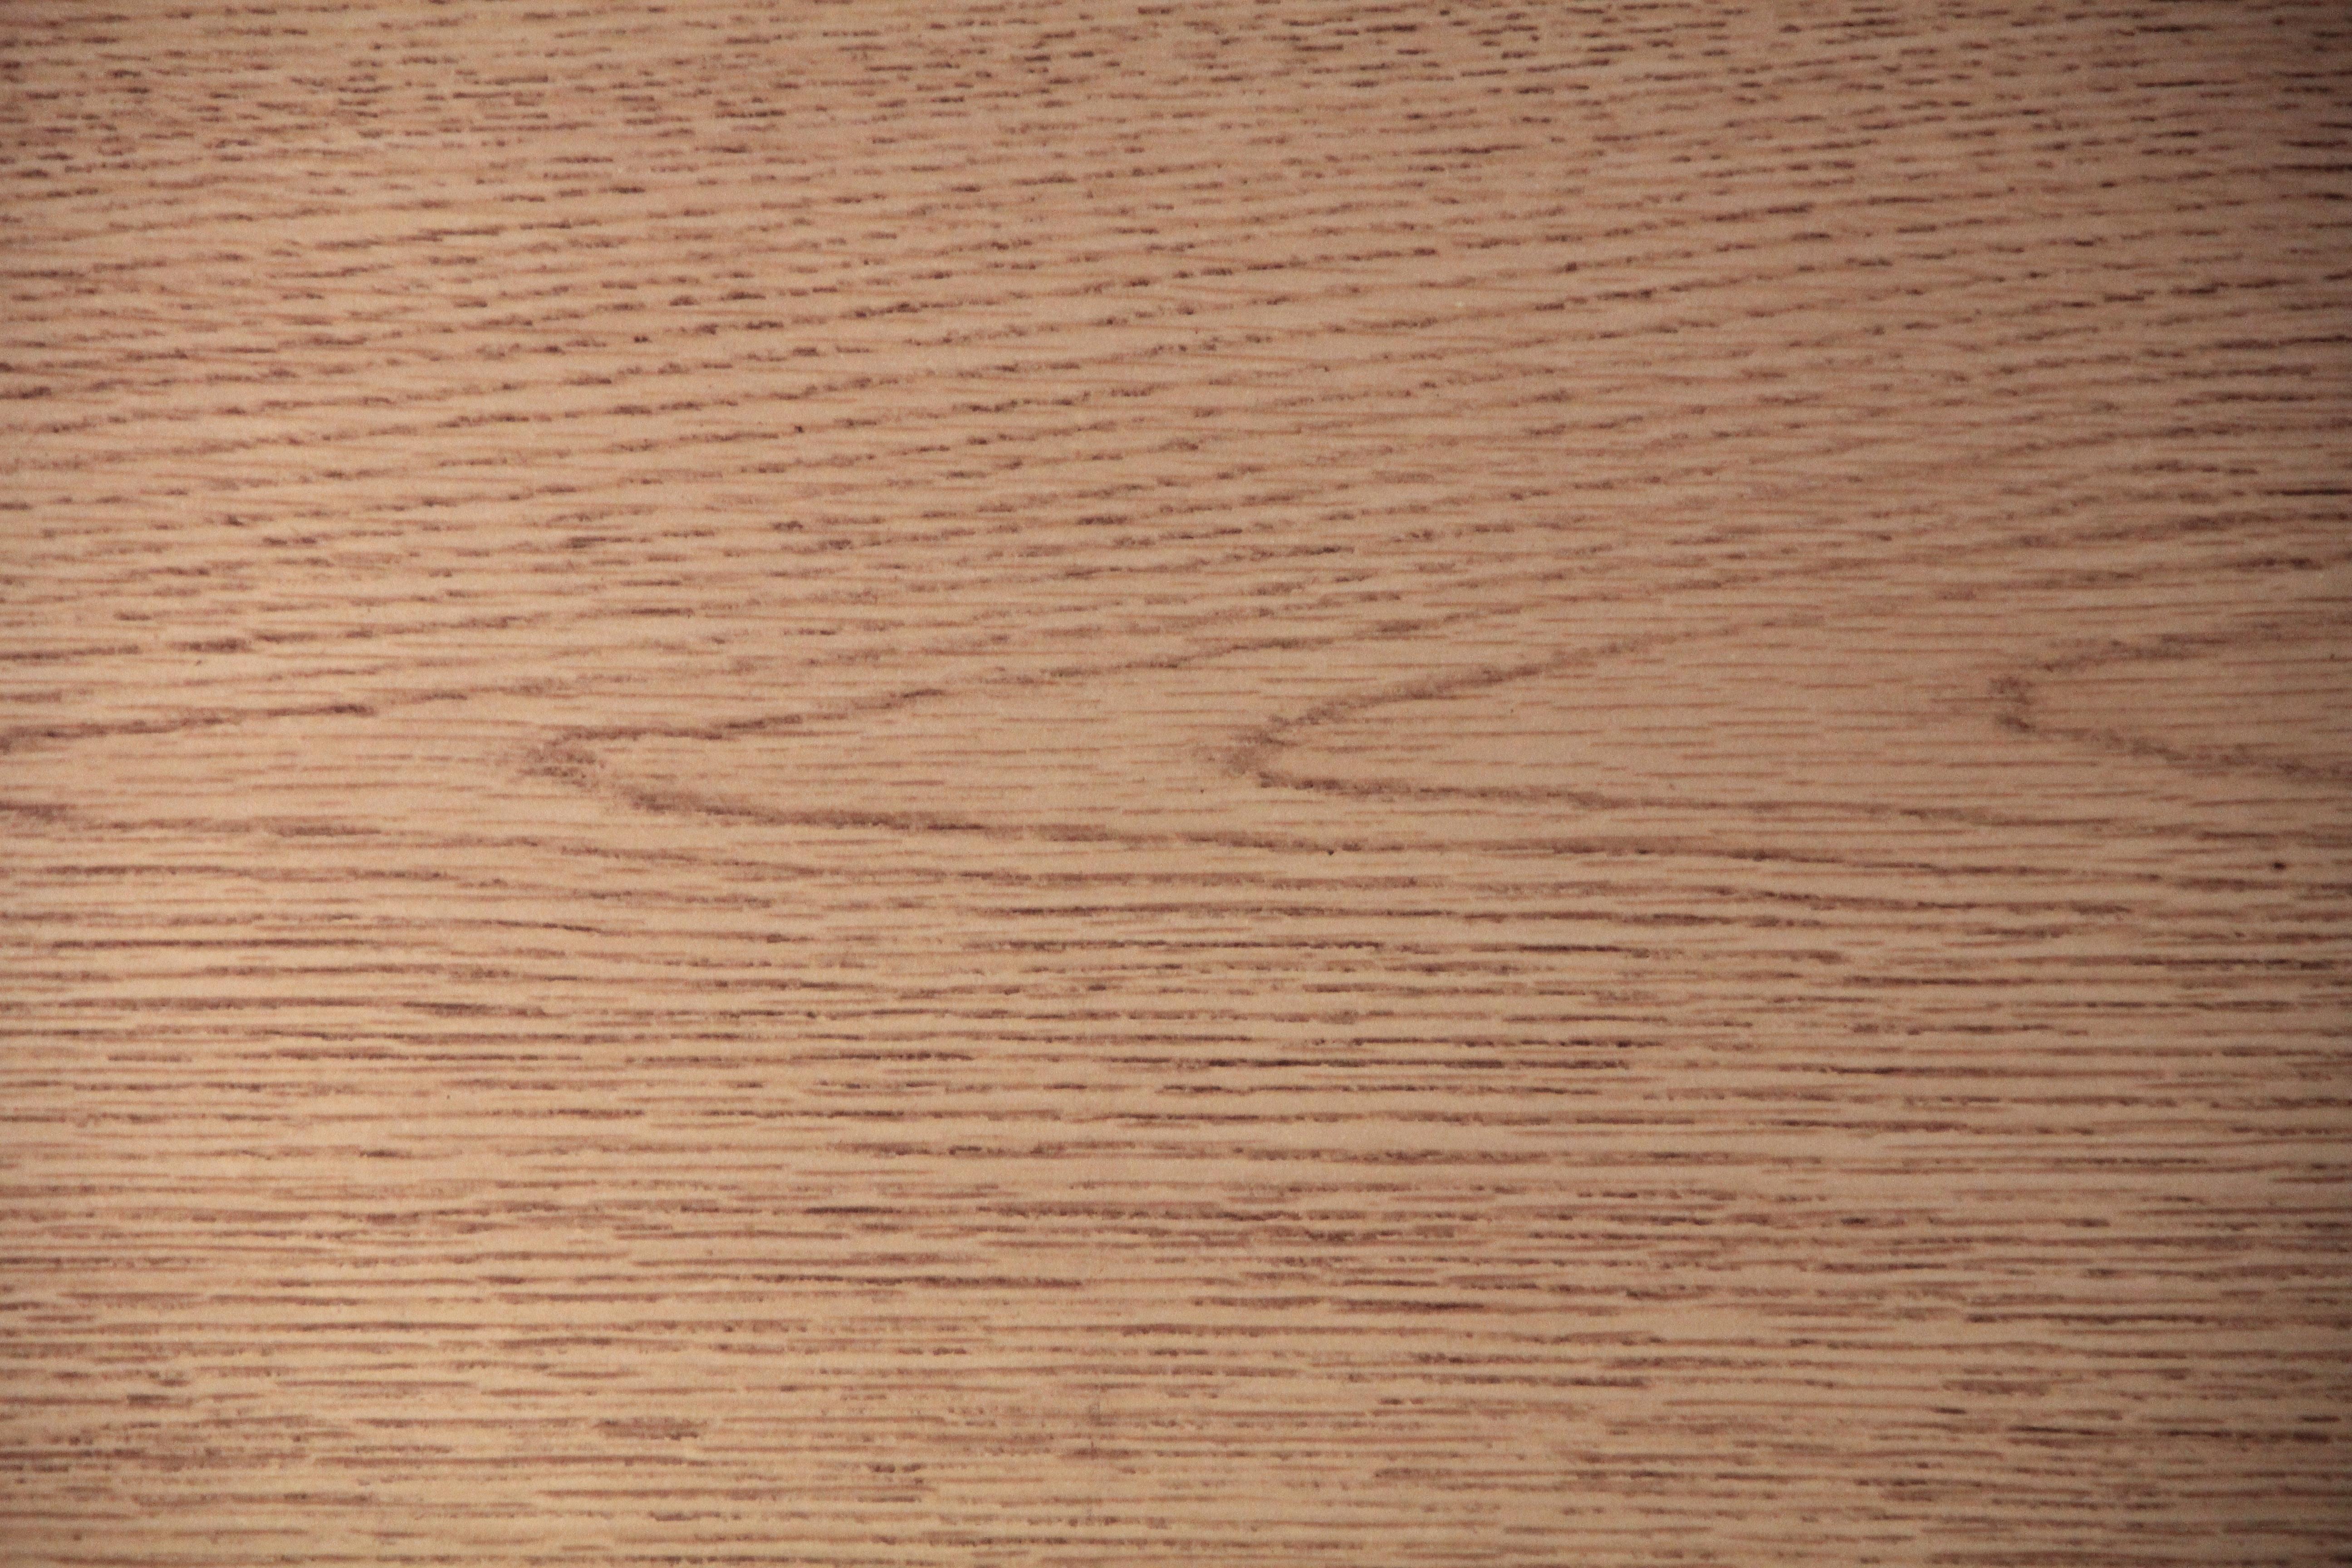 Wooden panel texture photo